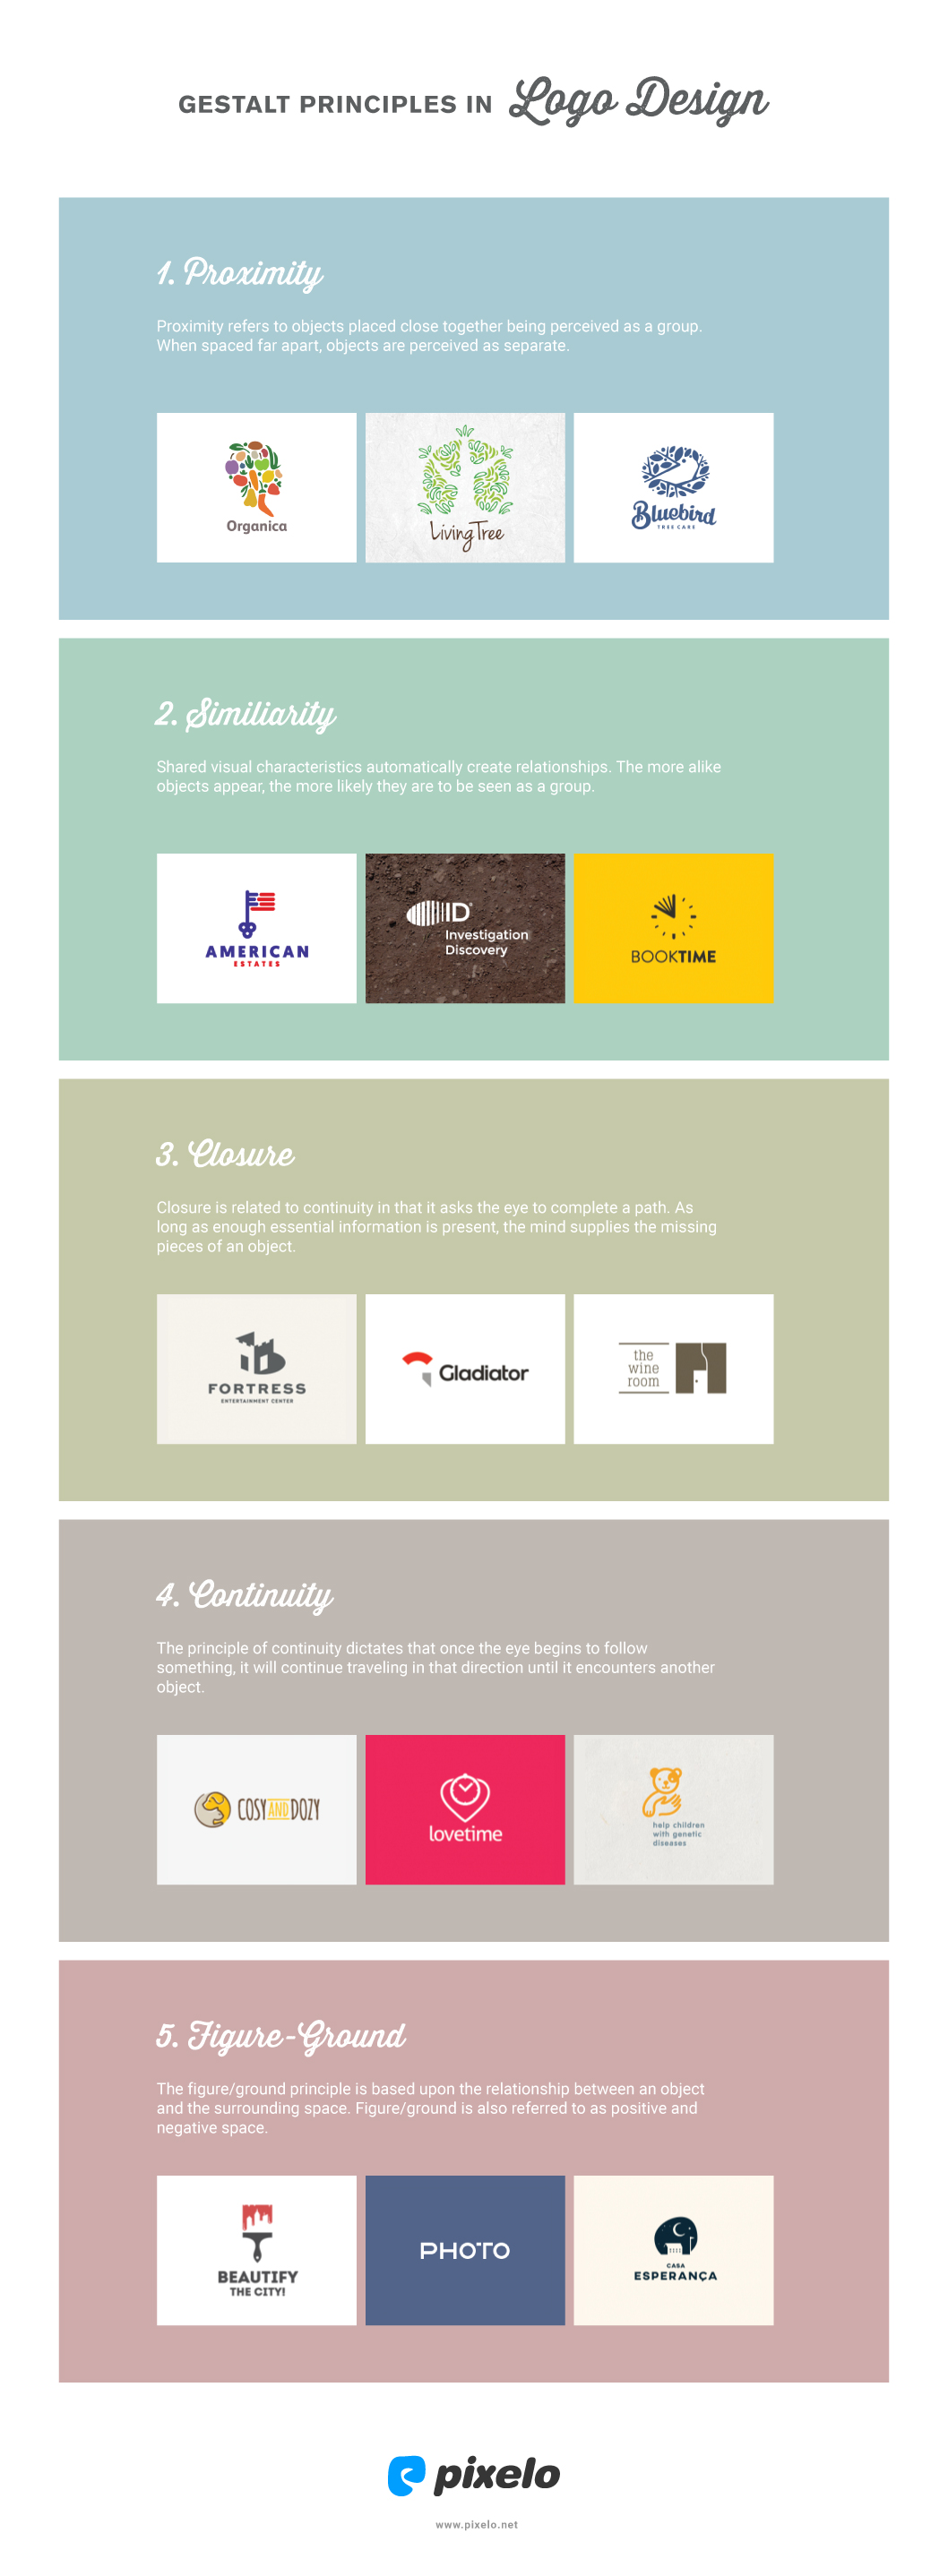 Gestalt principles in logo design